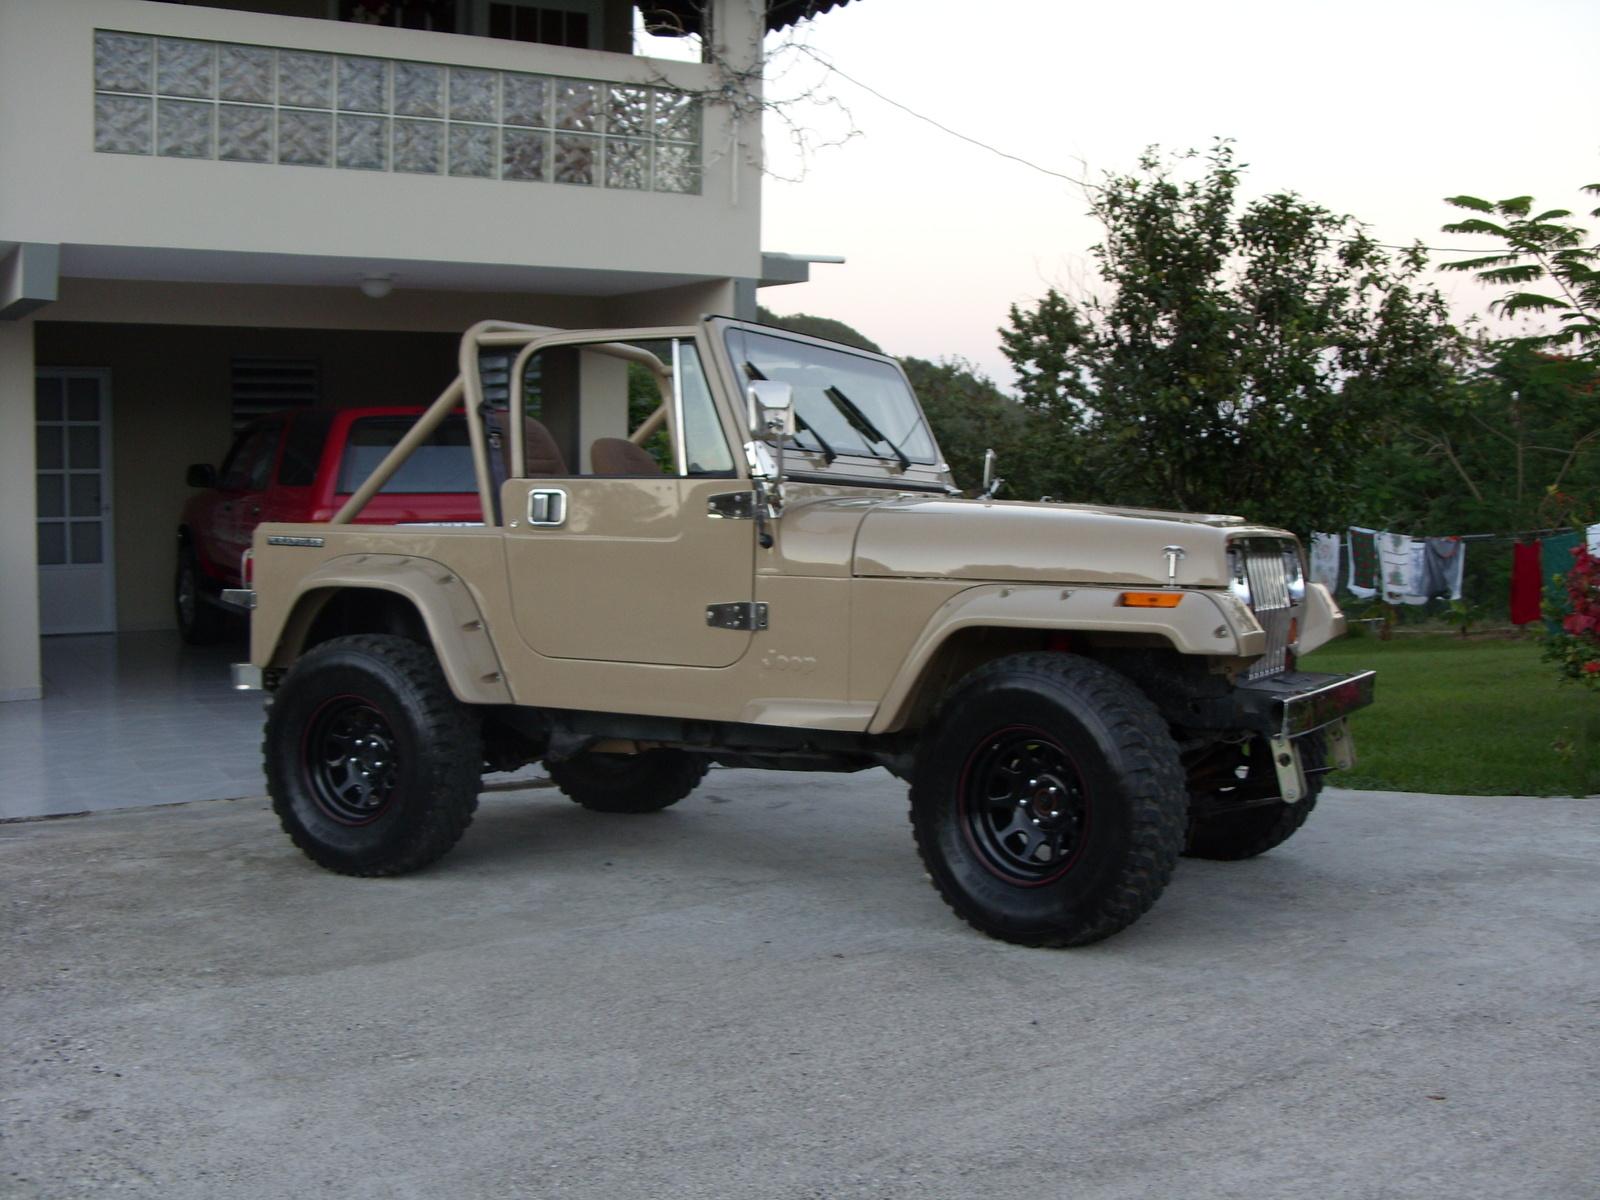 1988 Jeep Wrangler - Pictures - CarGurus